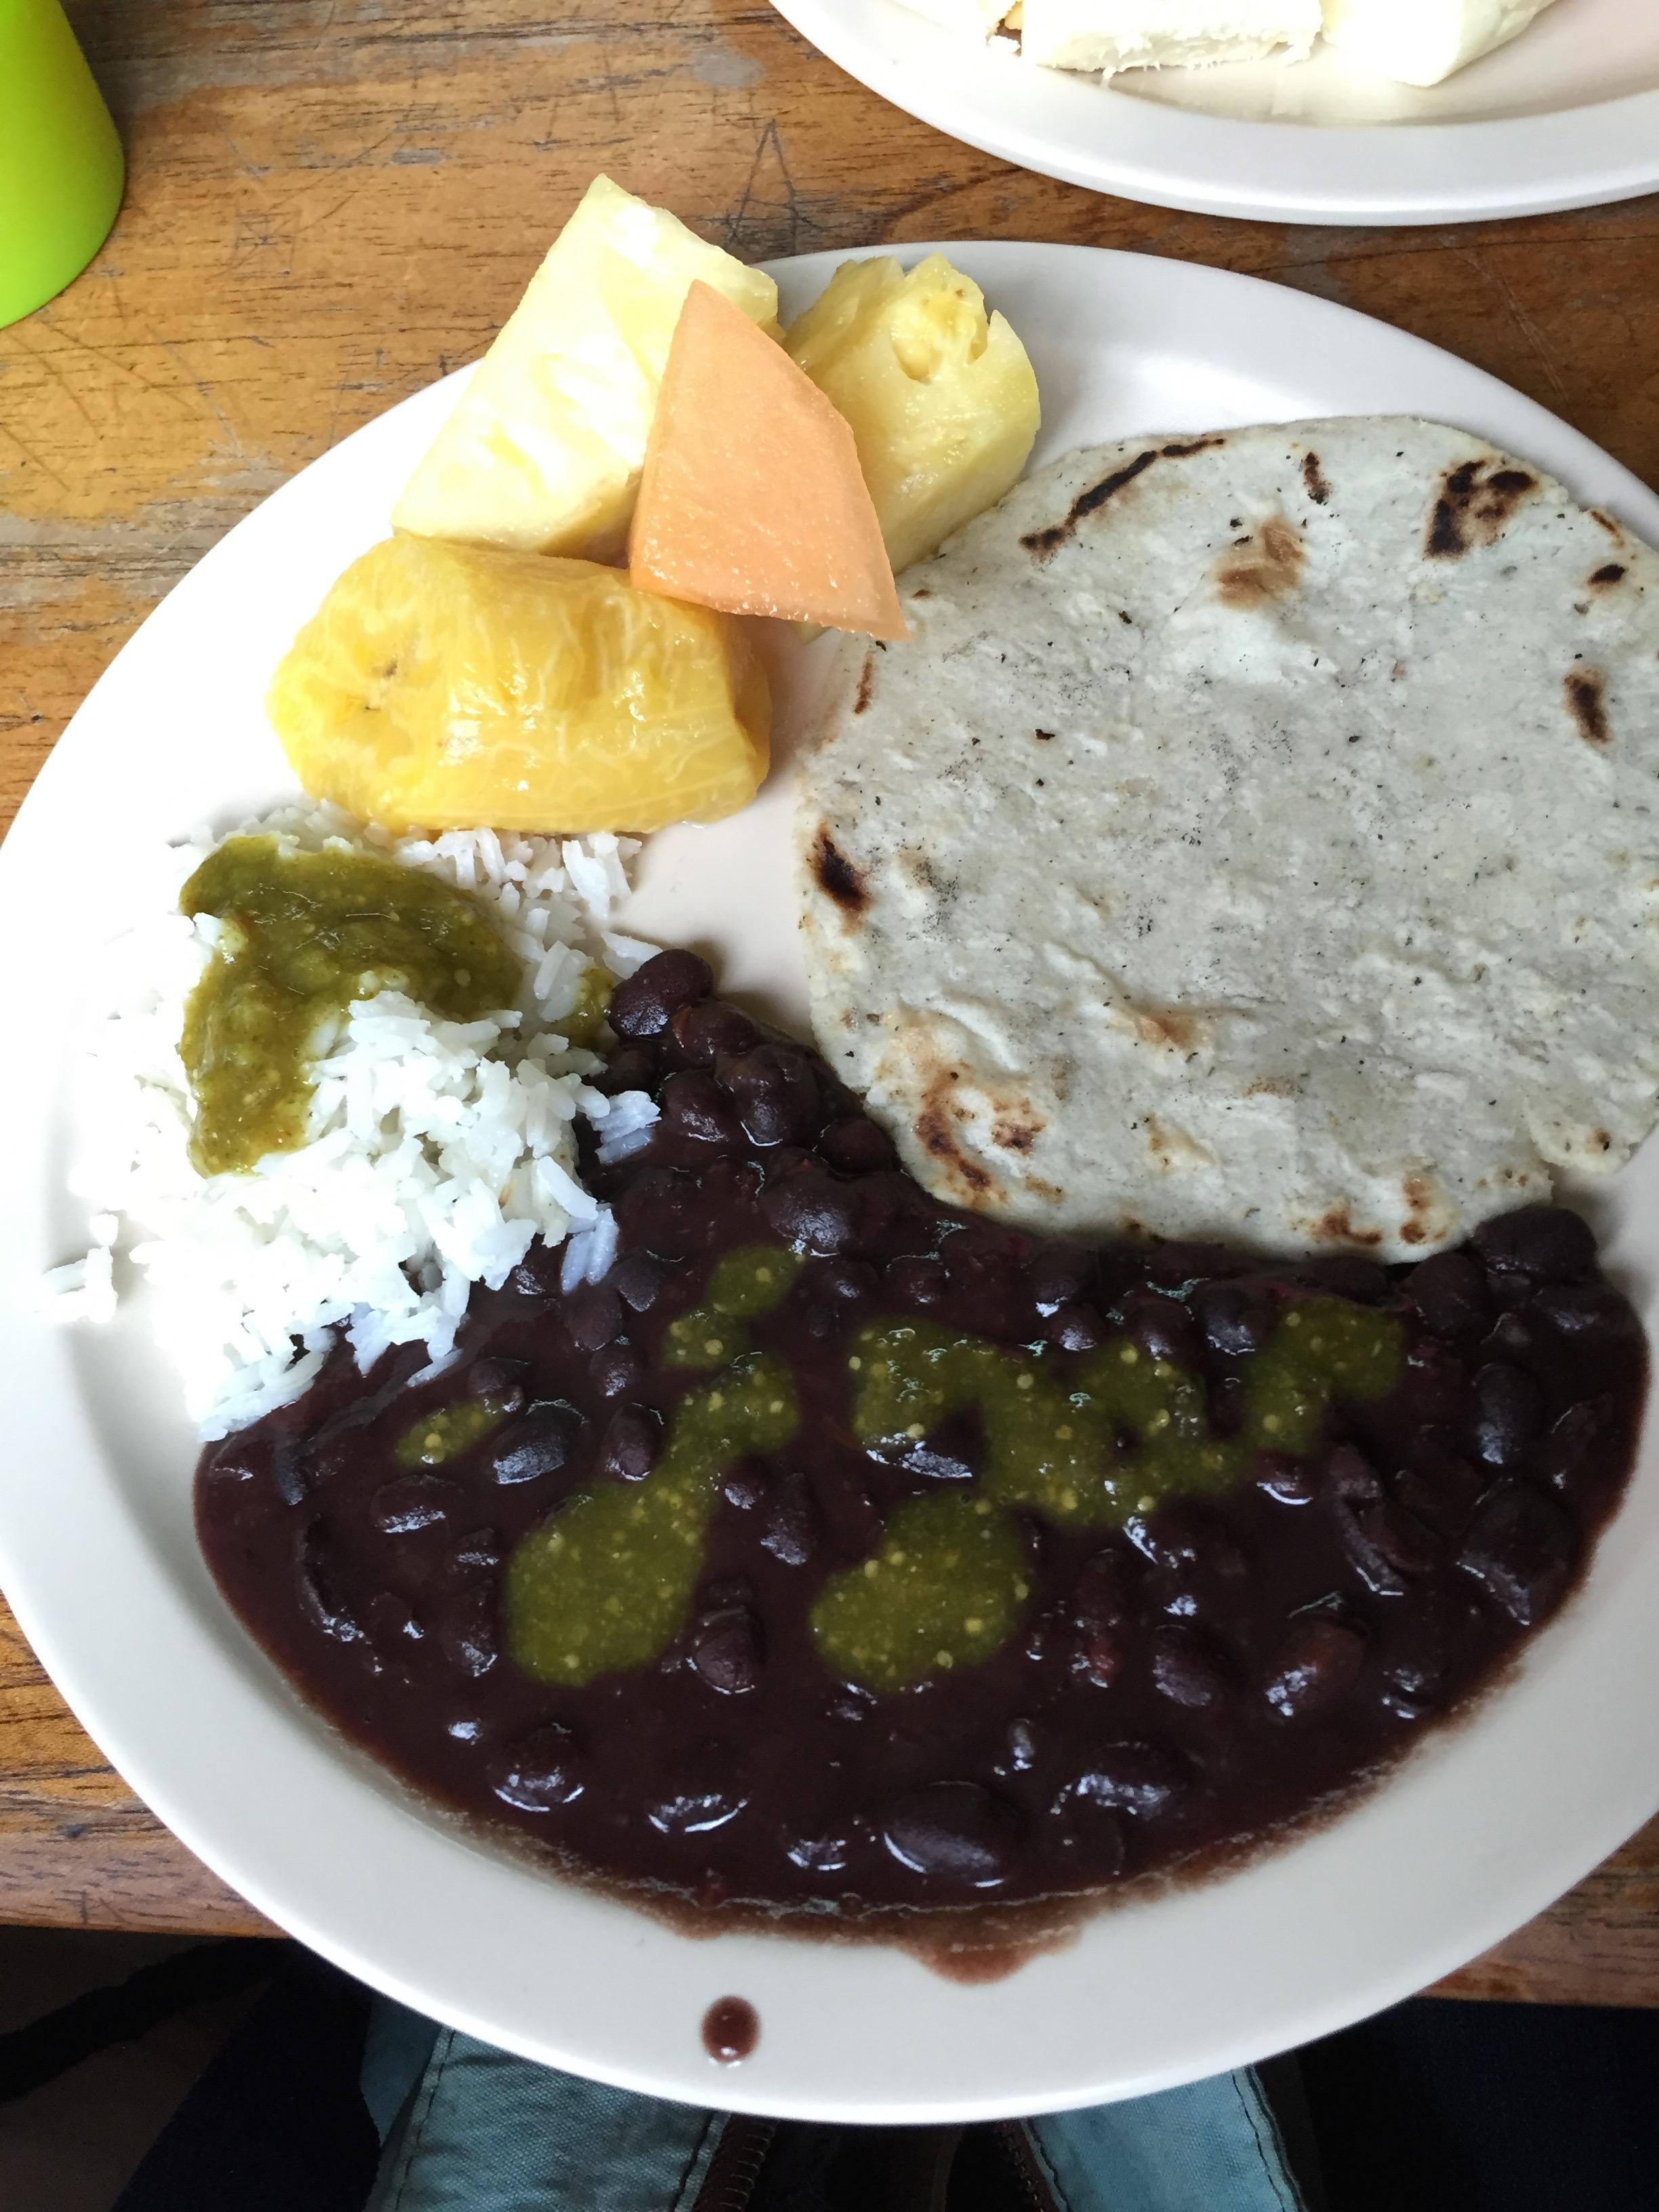 Breakfast -black beans, tortillas, rice and fruit